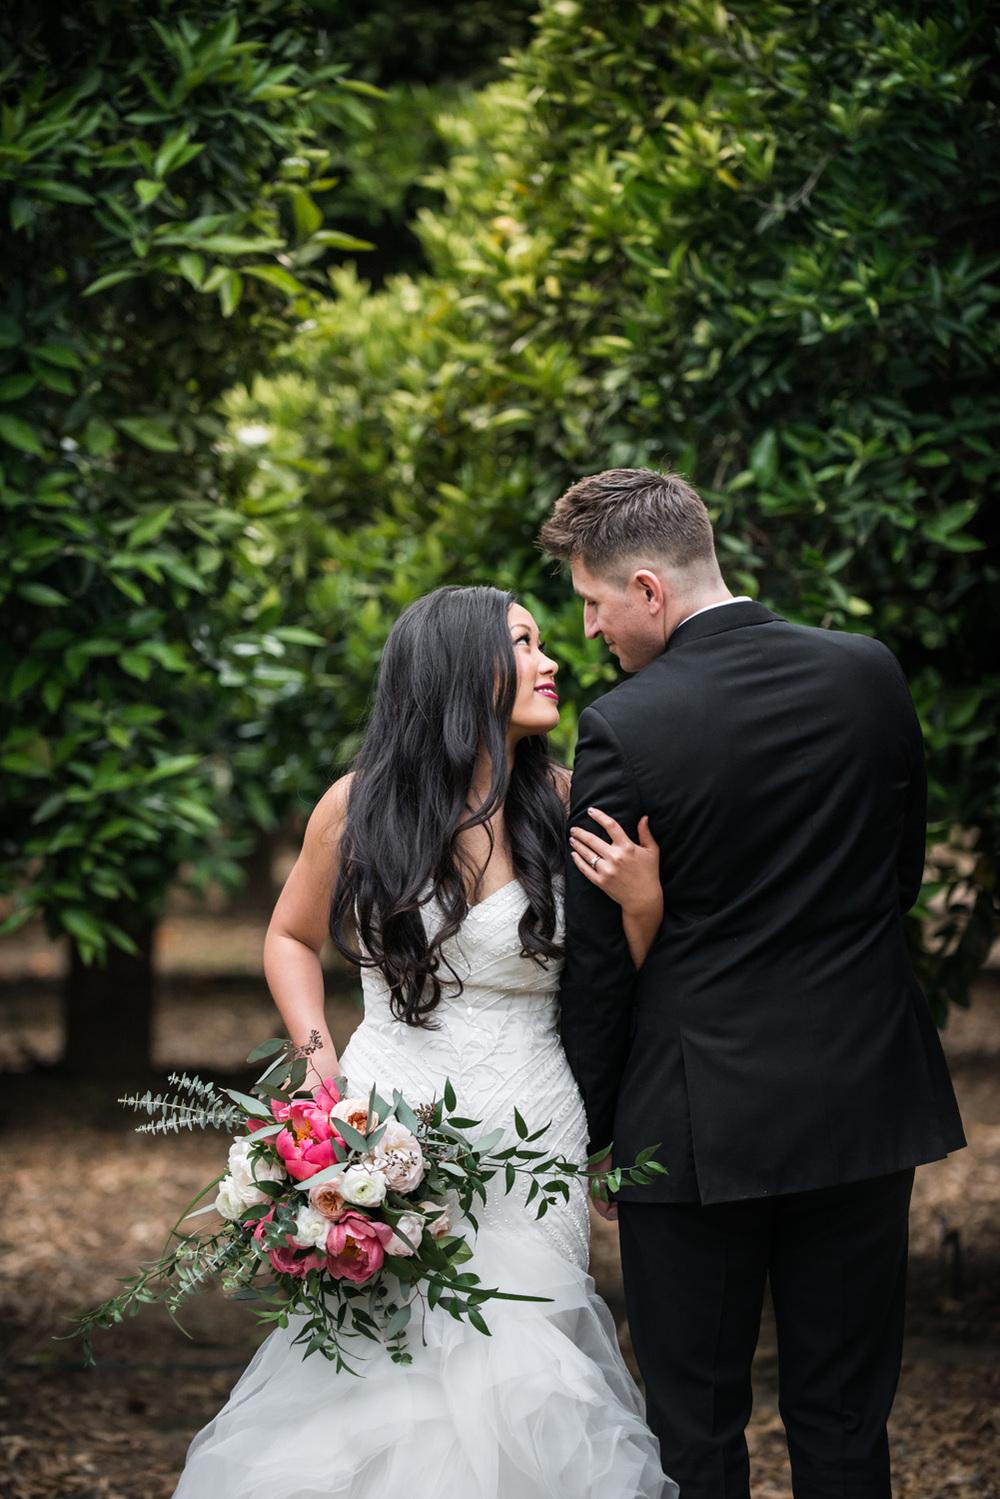 realcouple_bouquet_anniversarysession_orangegroves_redlands_prospectpark